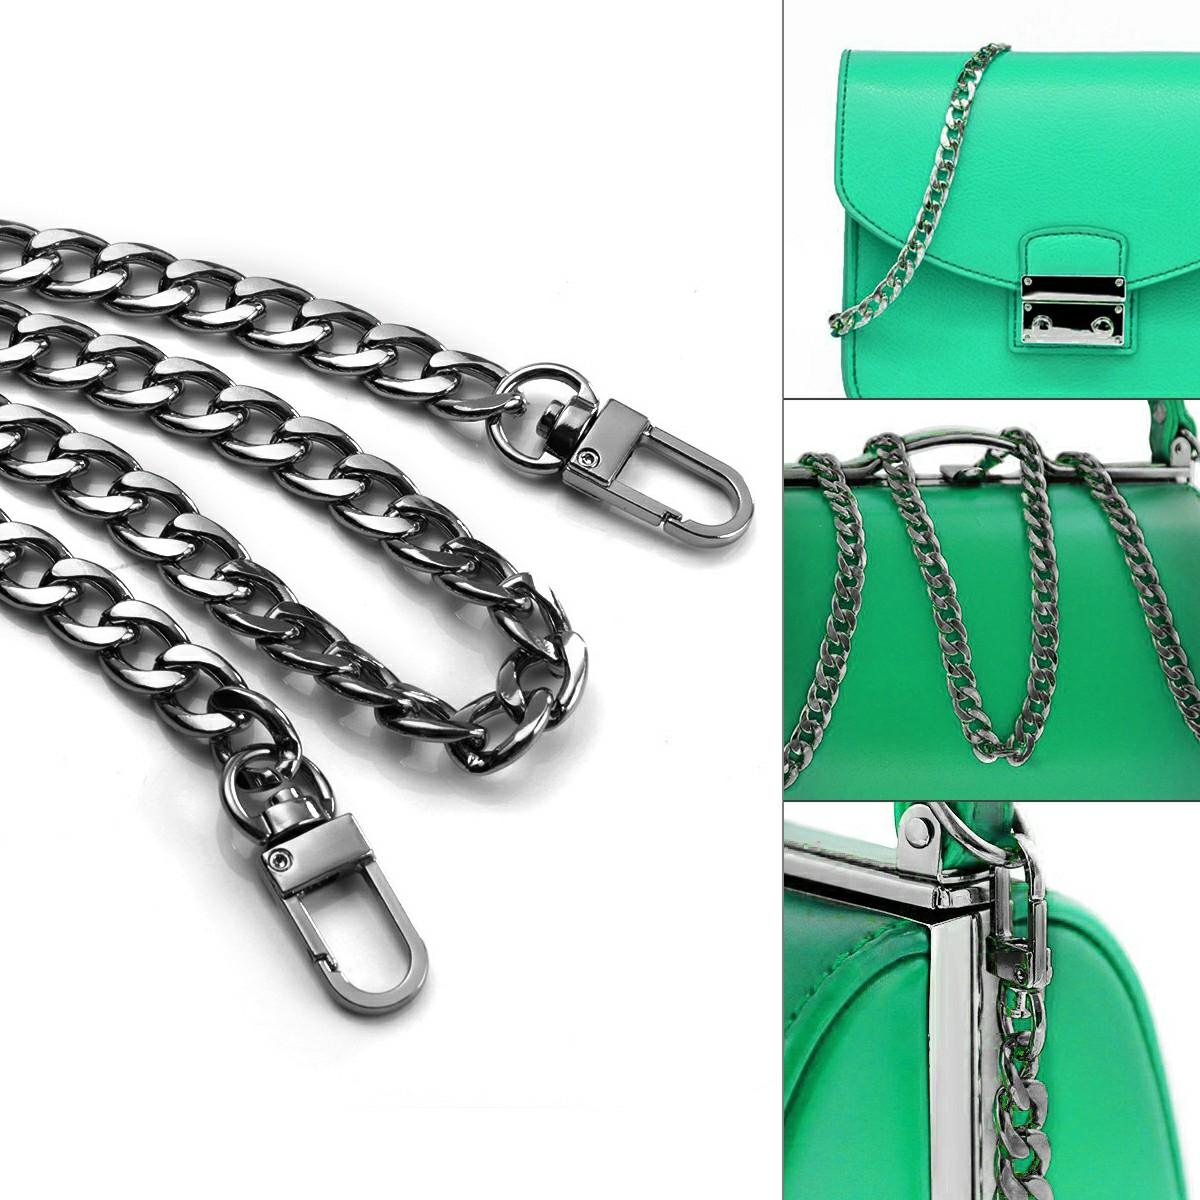 Metal Flat Chain Replacement Strap for Handbag - Black